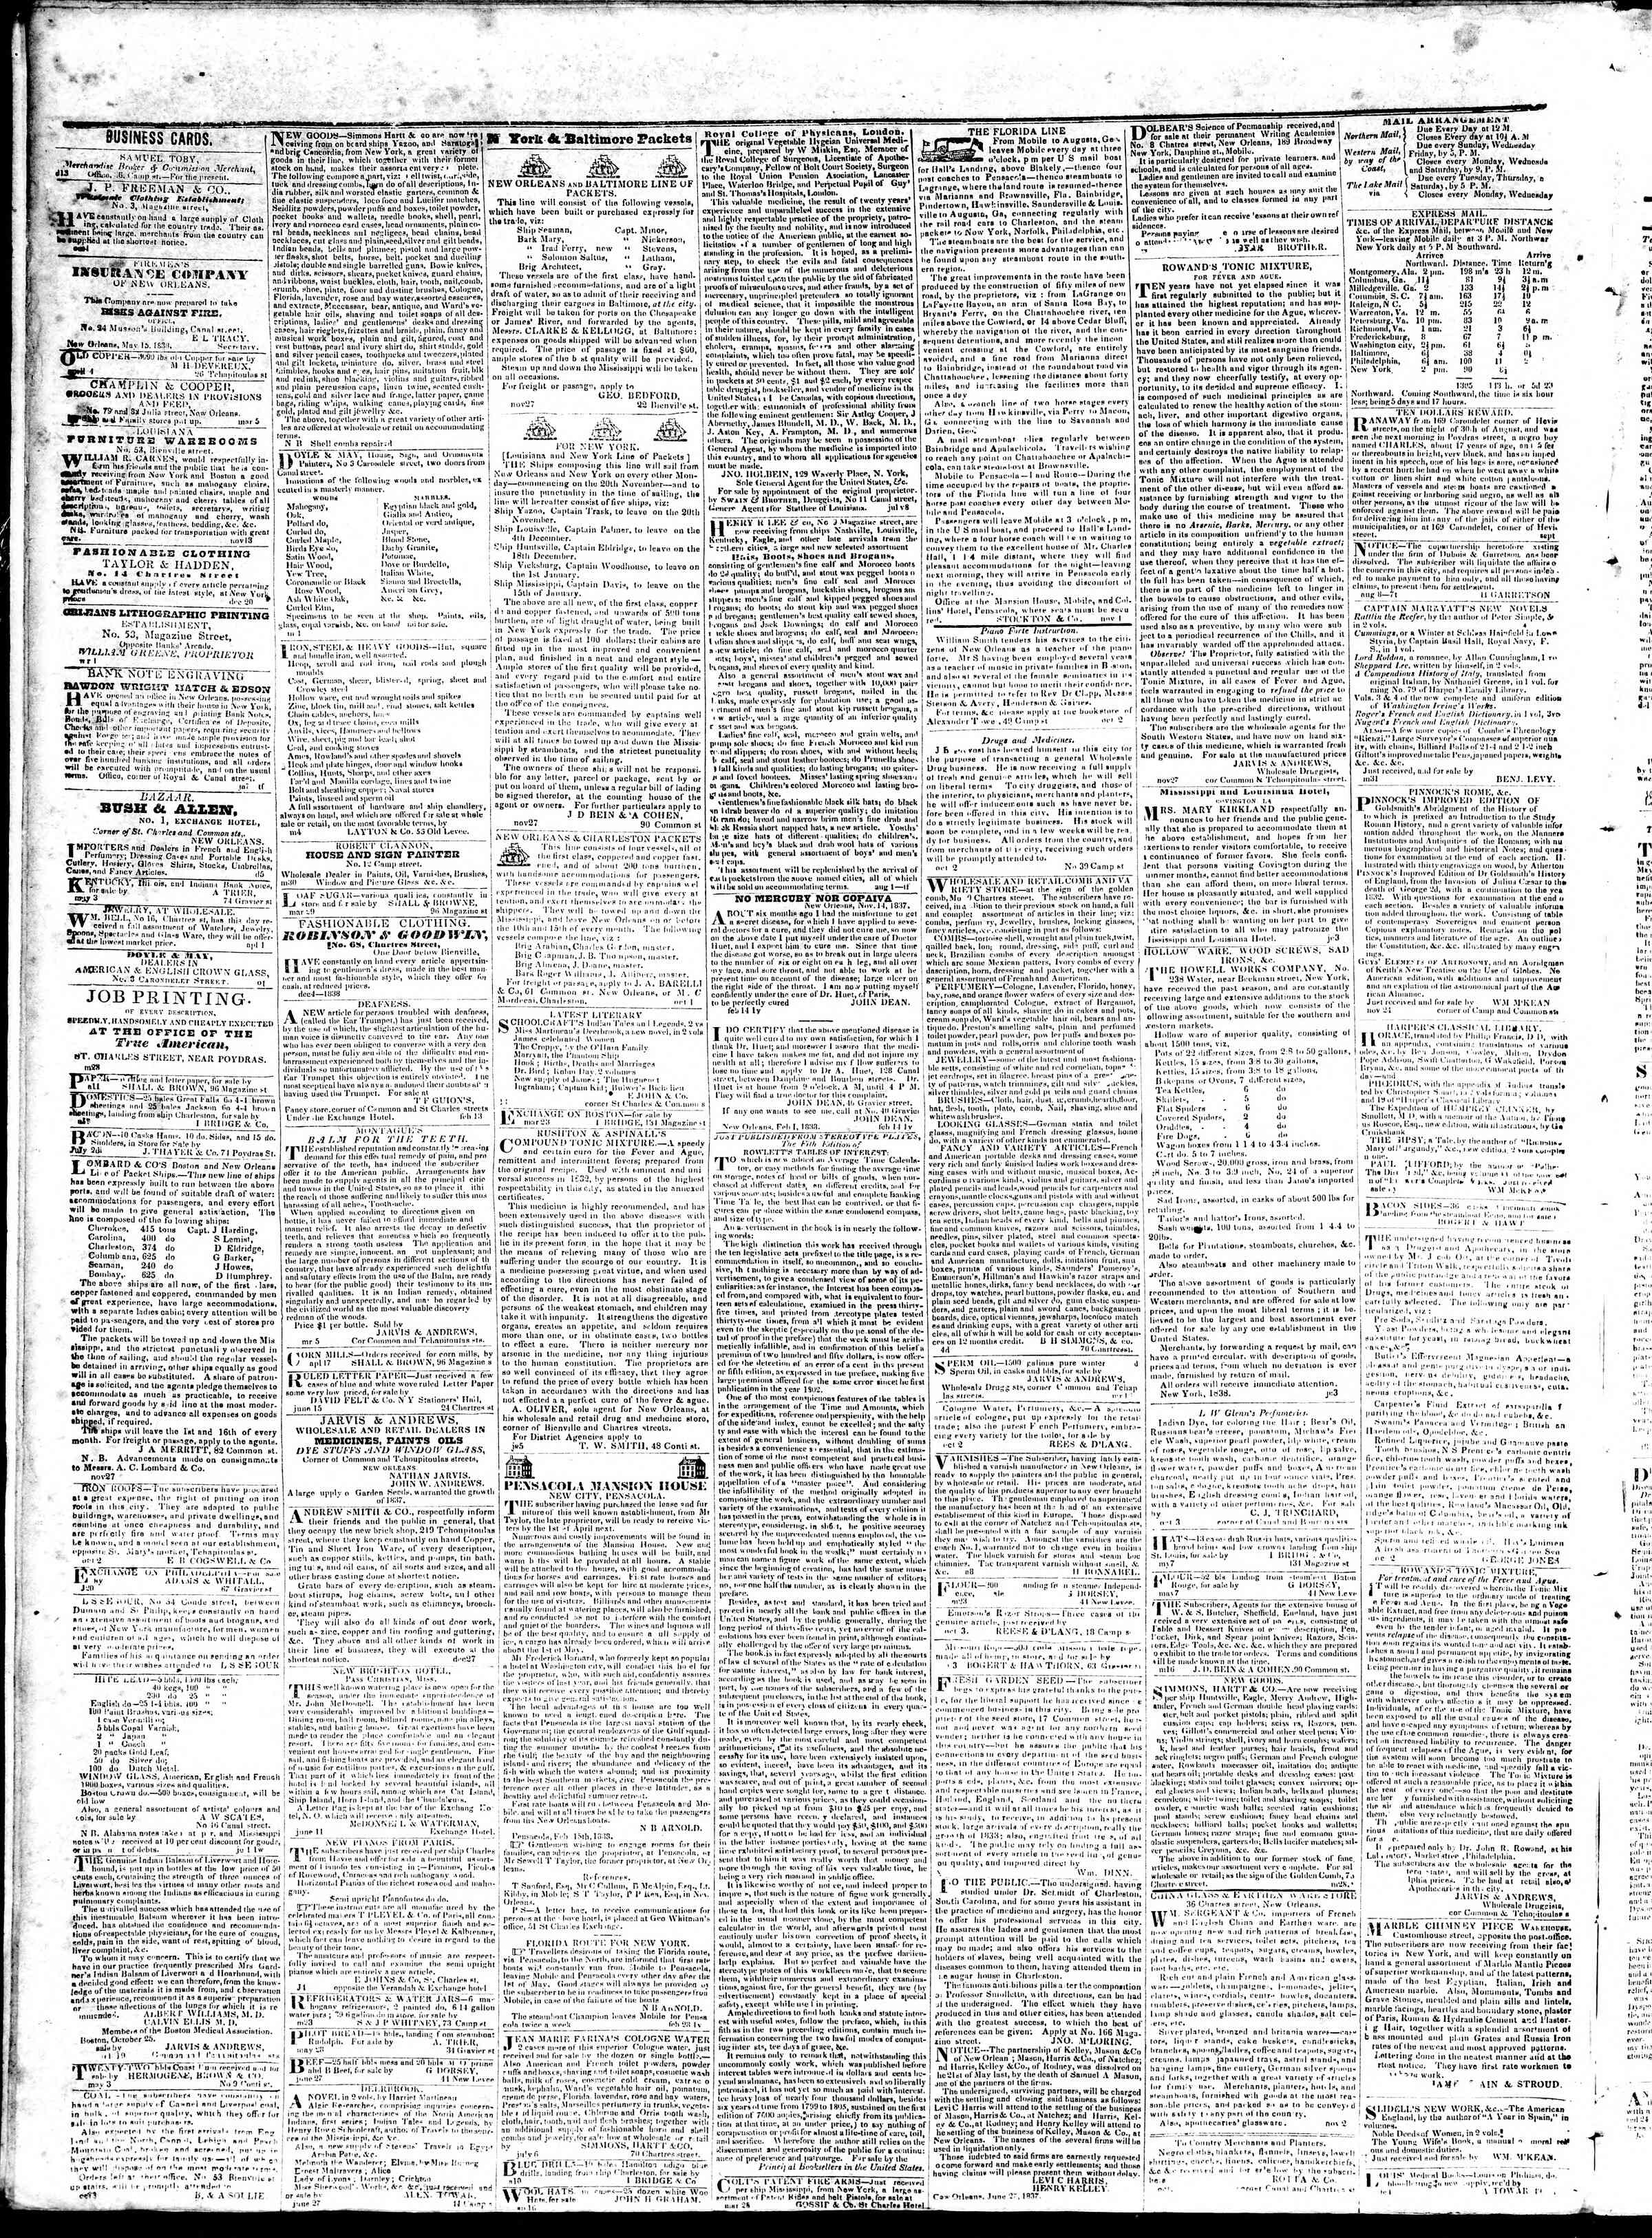 September 28, 1839 Tarihli True American Gazetesi Sayfa 4